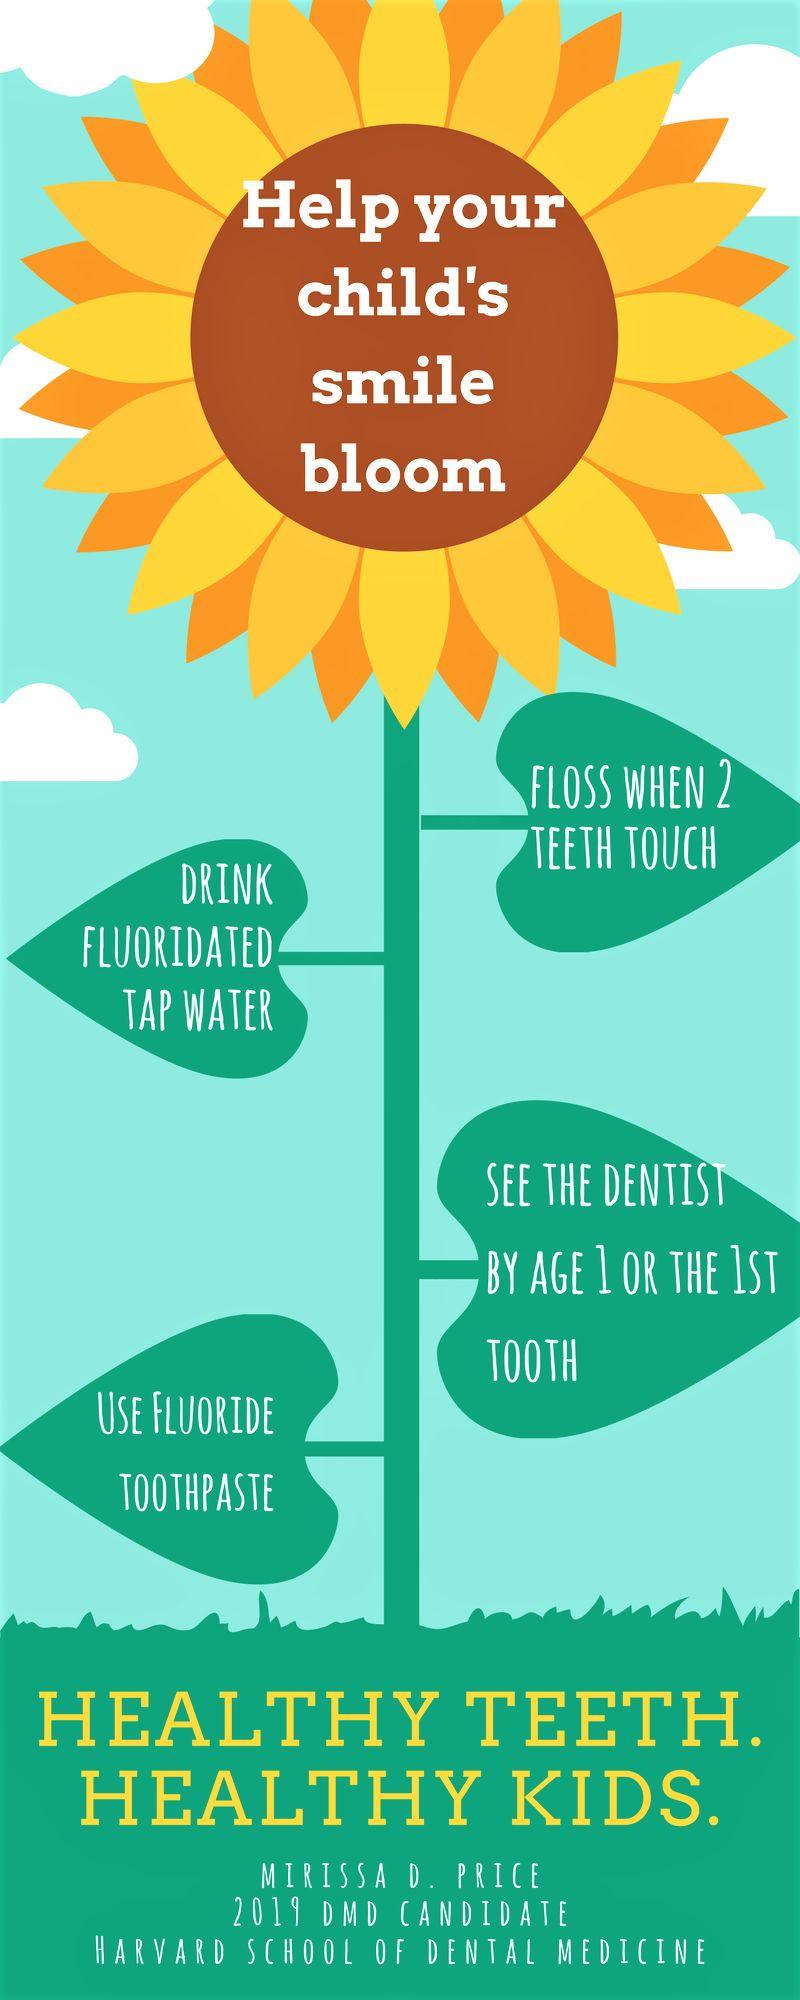 Dental Health Tips for Kids: Help Your Child\'s Smile Bloom | HuffPost